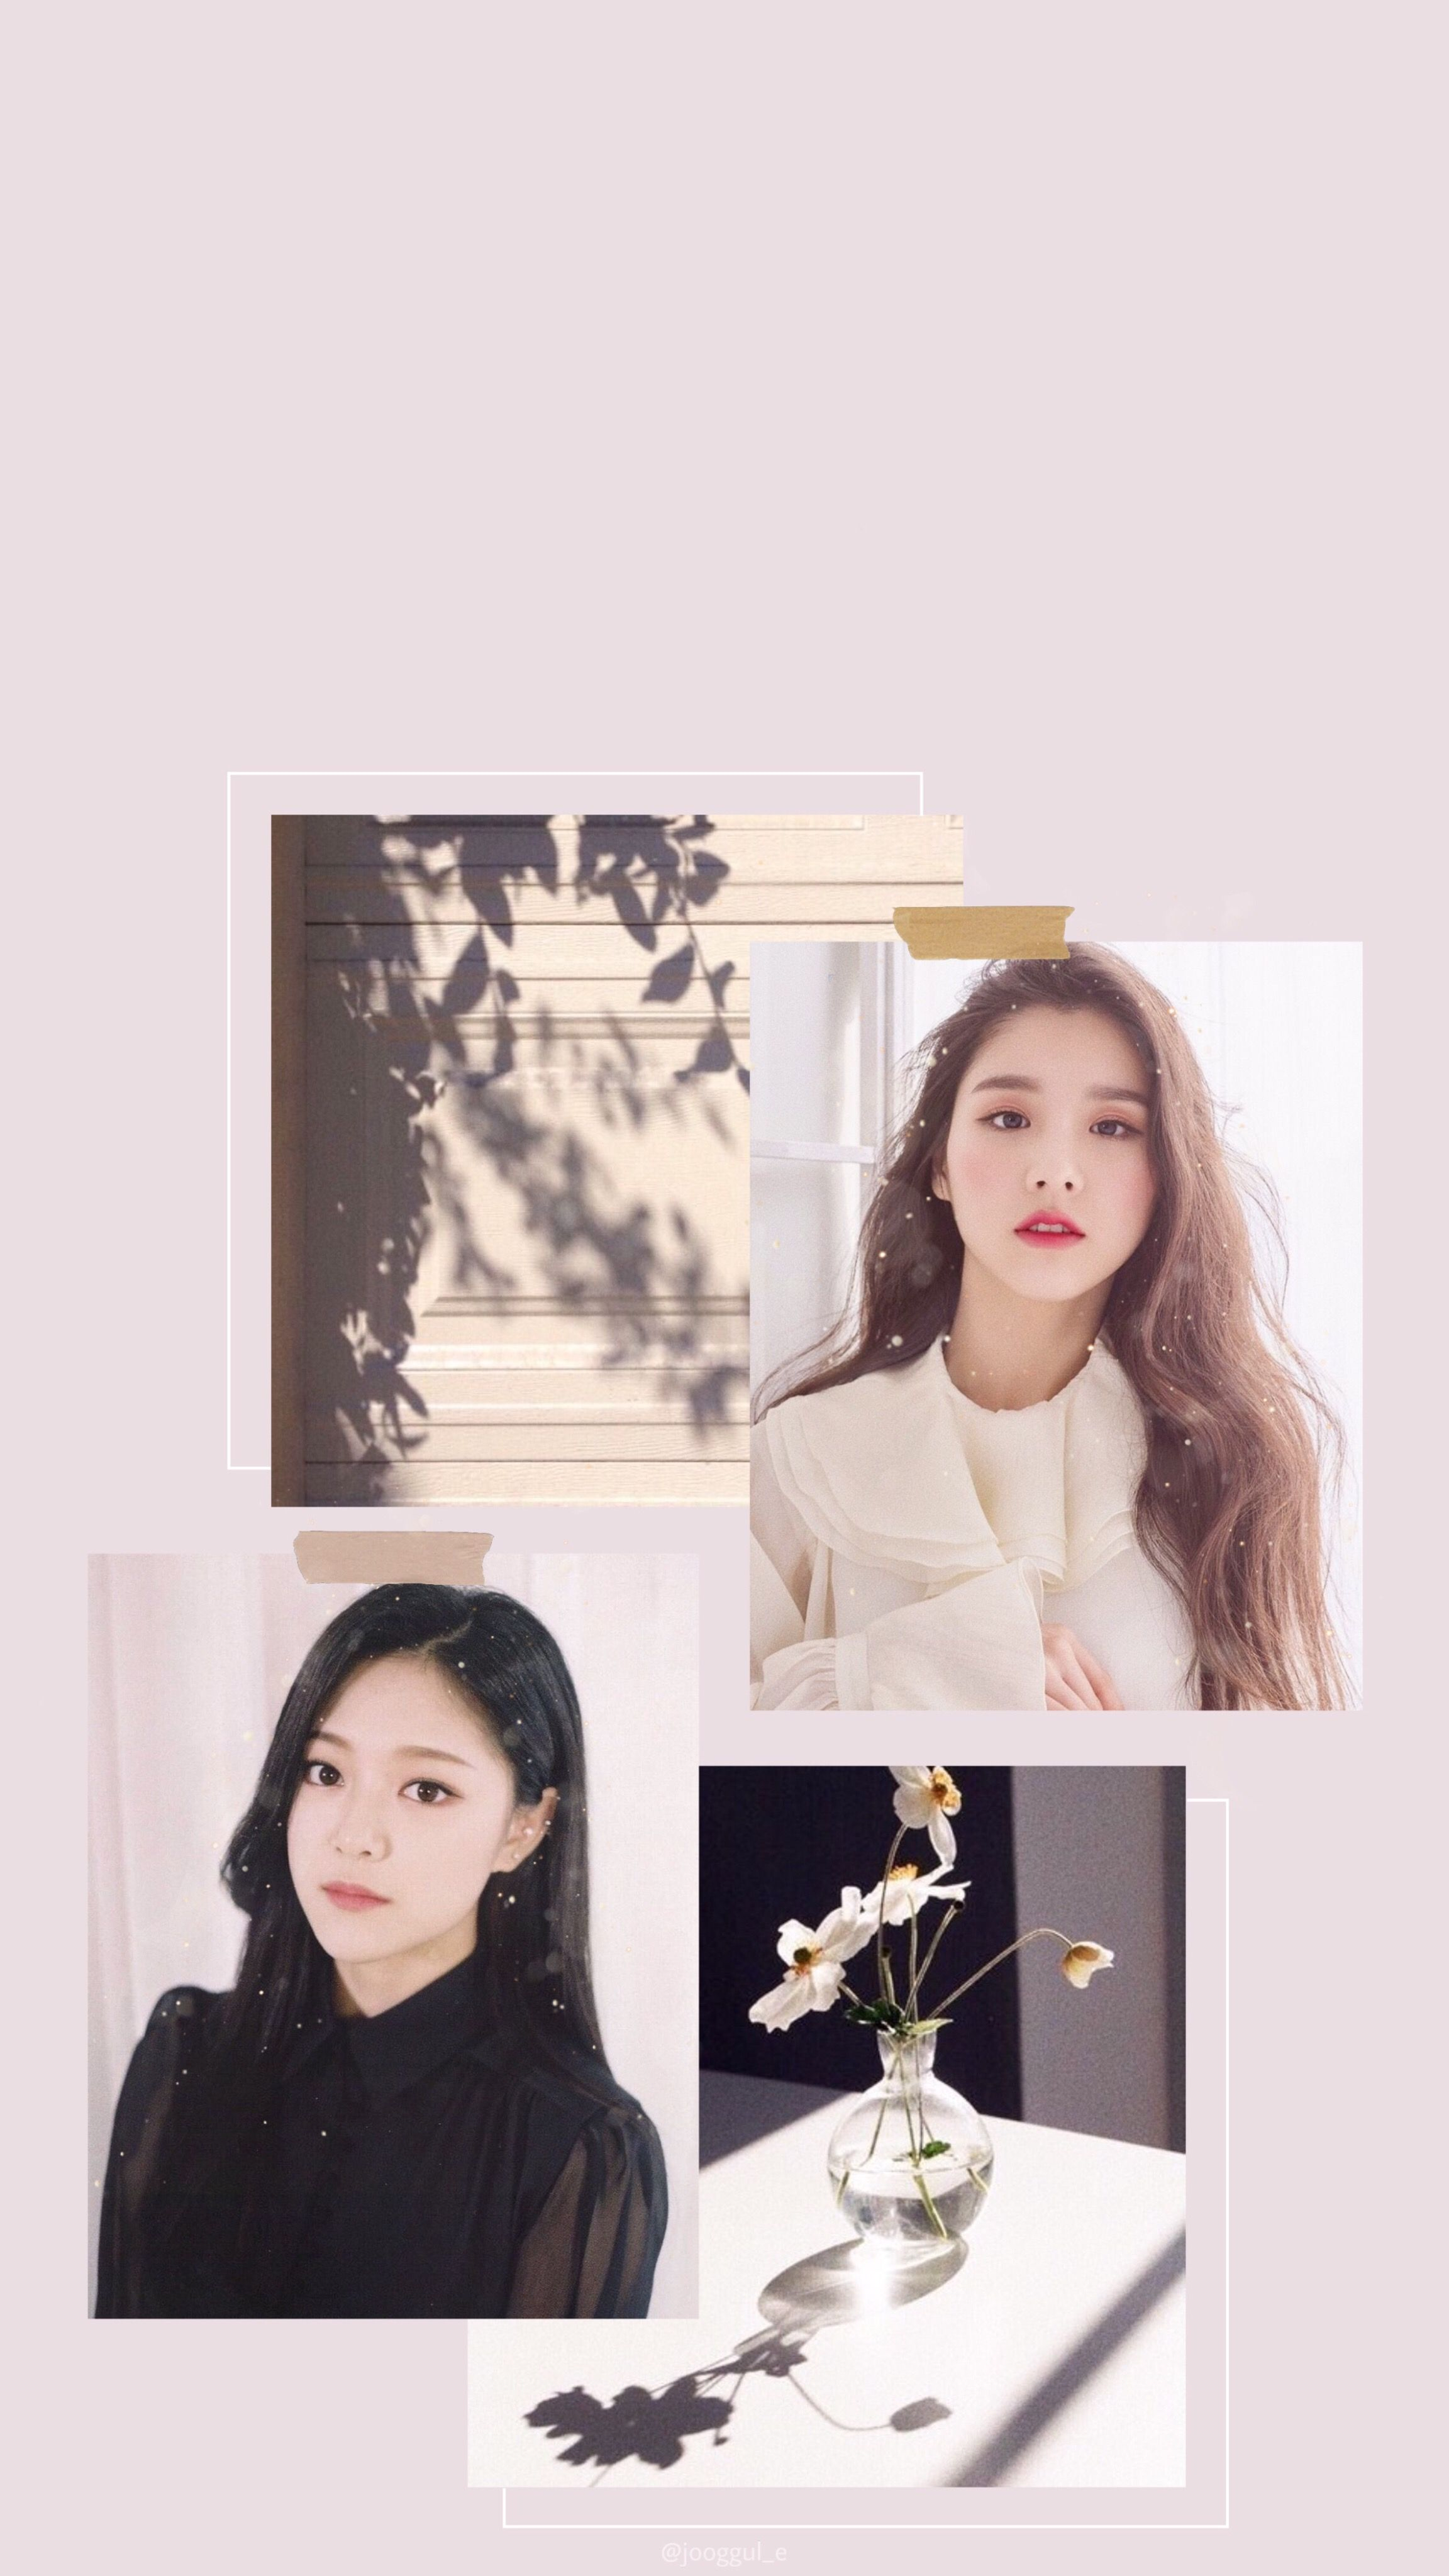 Loona Hyunjin Heejin Aesthetic Iphone Lockscreen